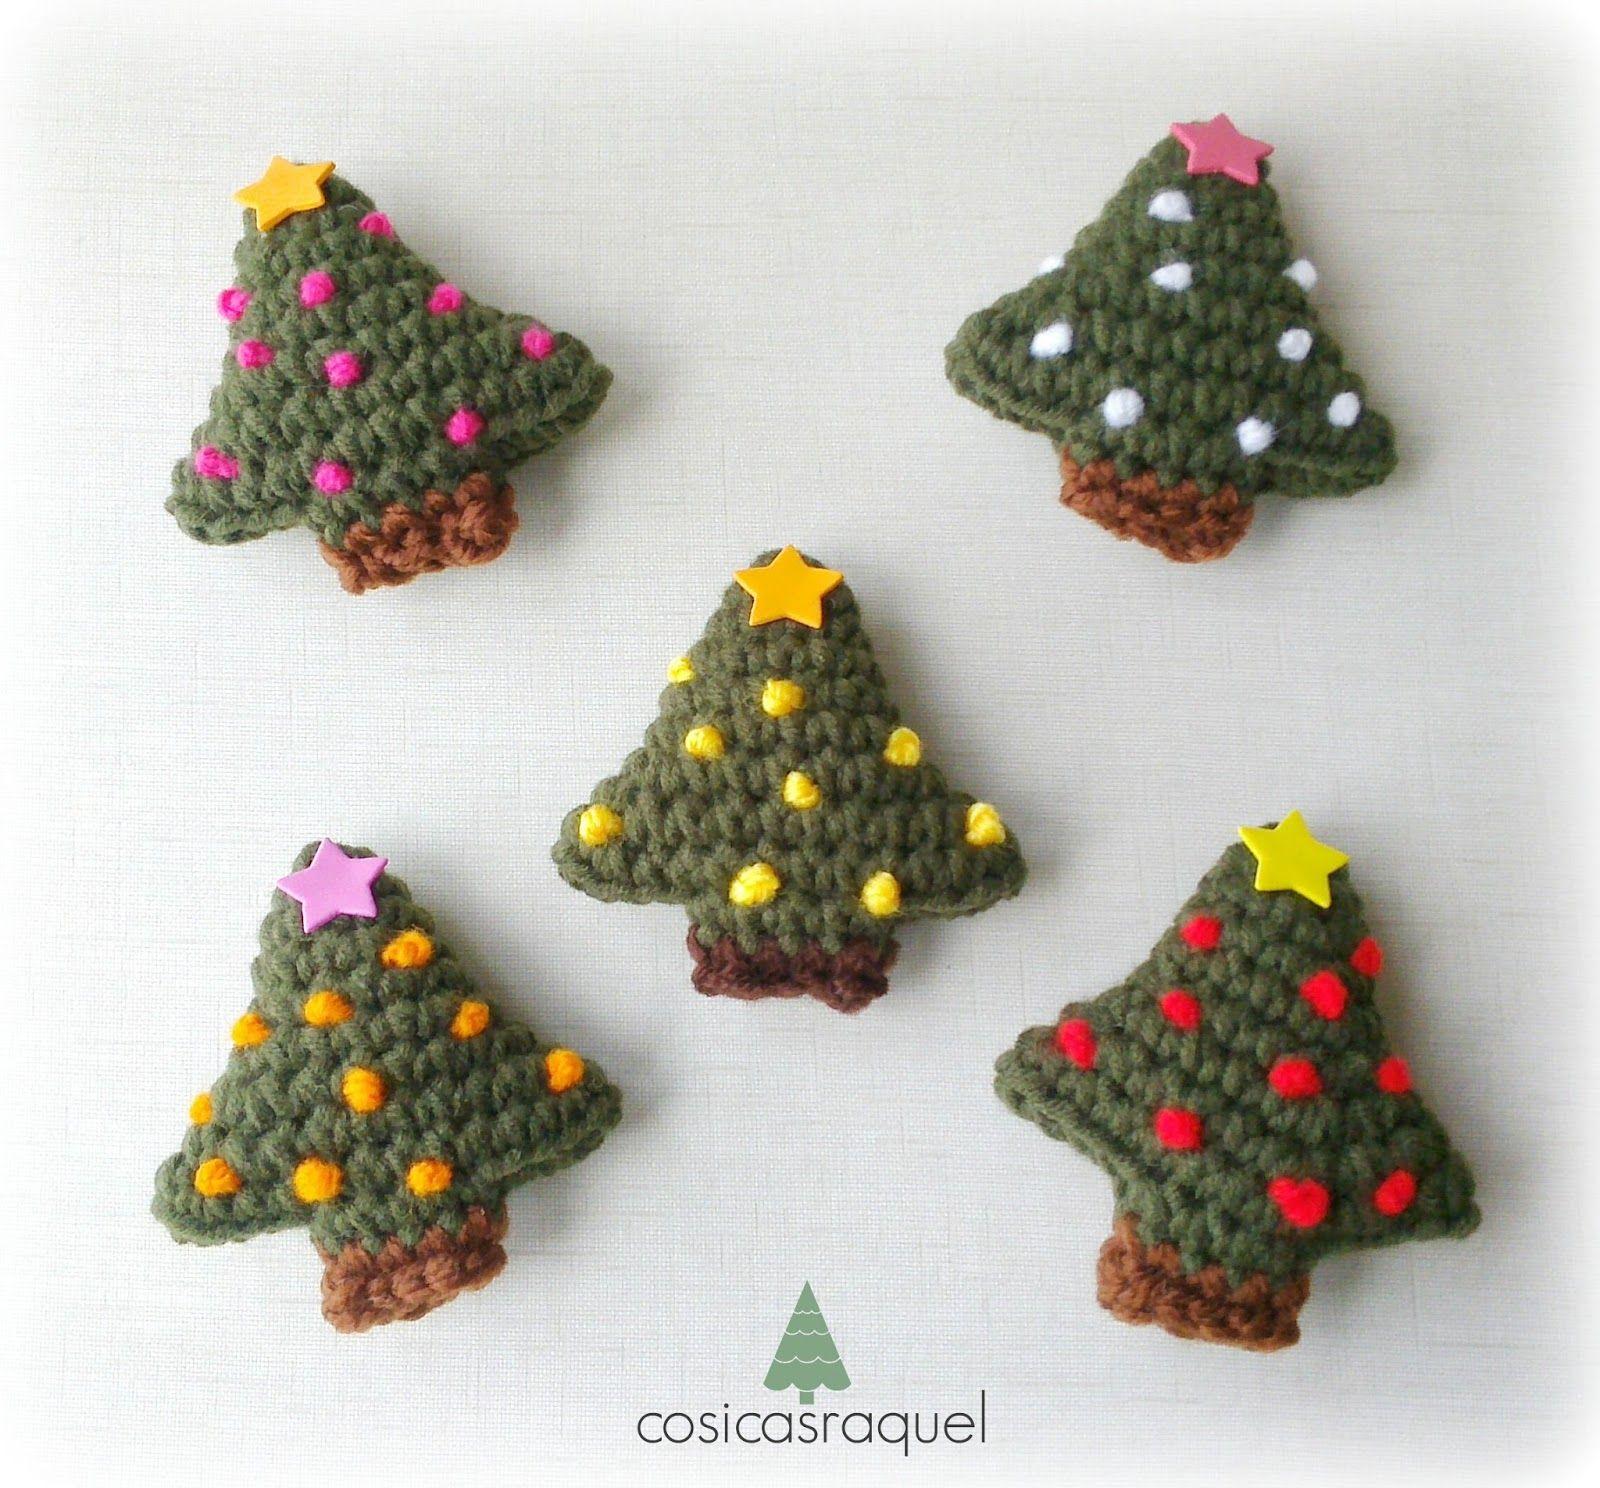 Imán Árbol de Navidad a Crochet | Pinterest | Imanes, Crochet ...